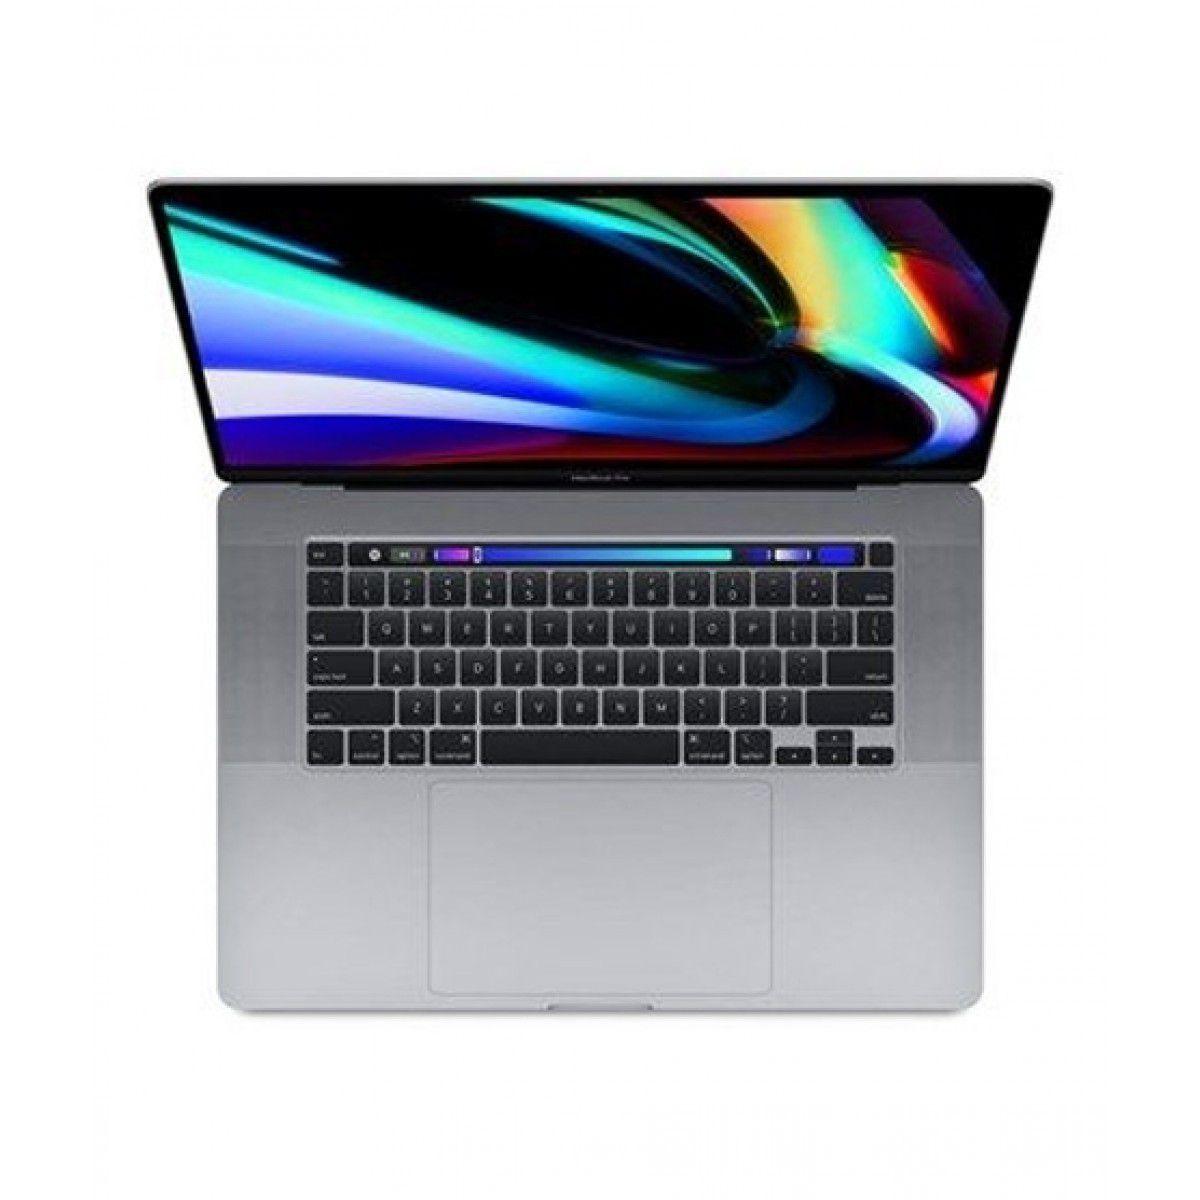 "Apple MacBook Pro 16"" Core i7 Space Gray (MVVJ2)"